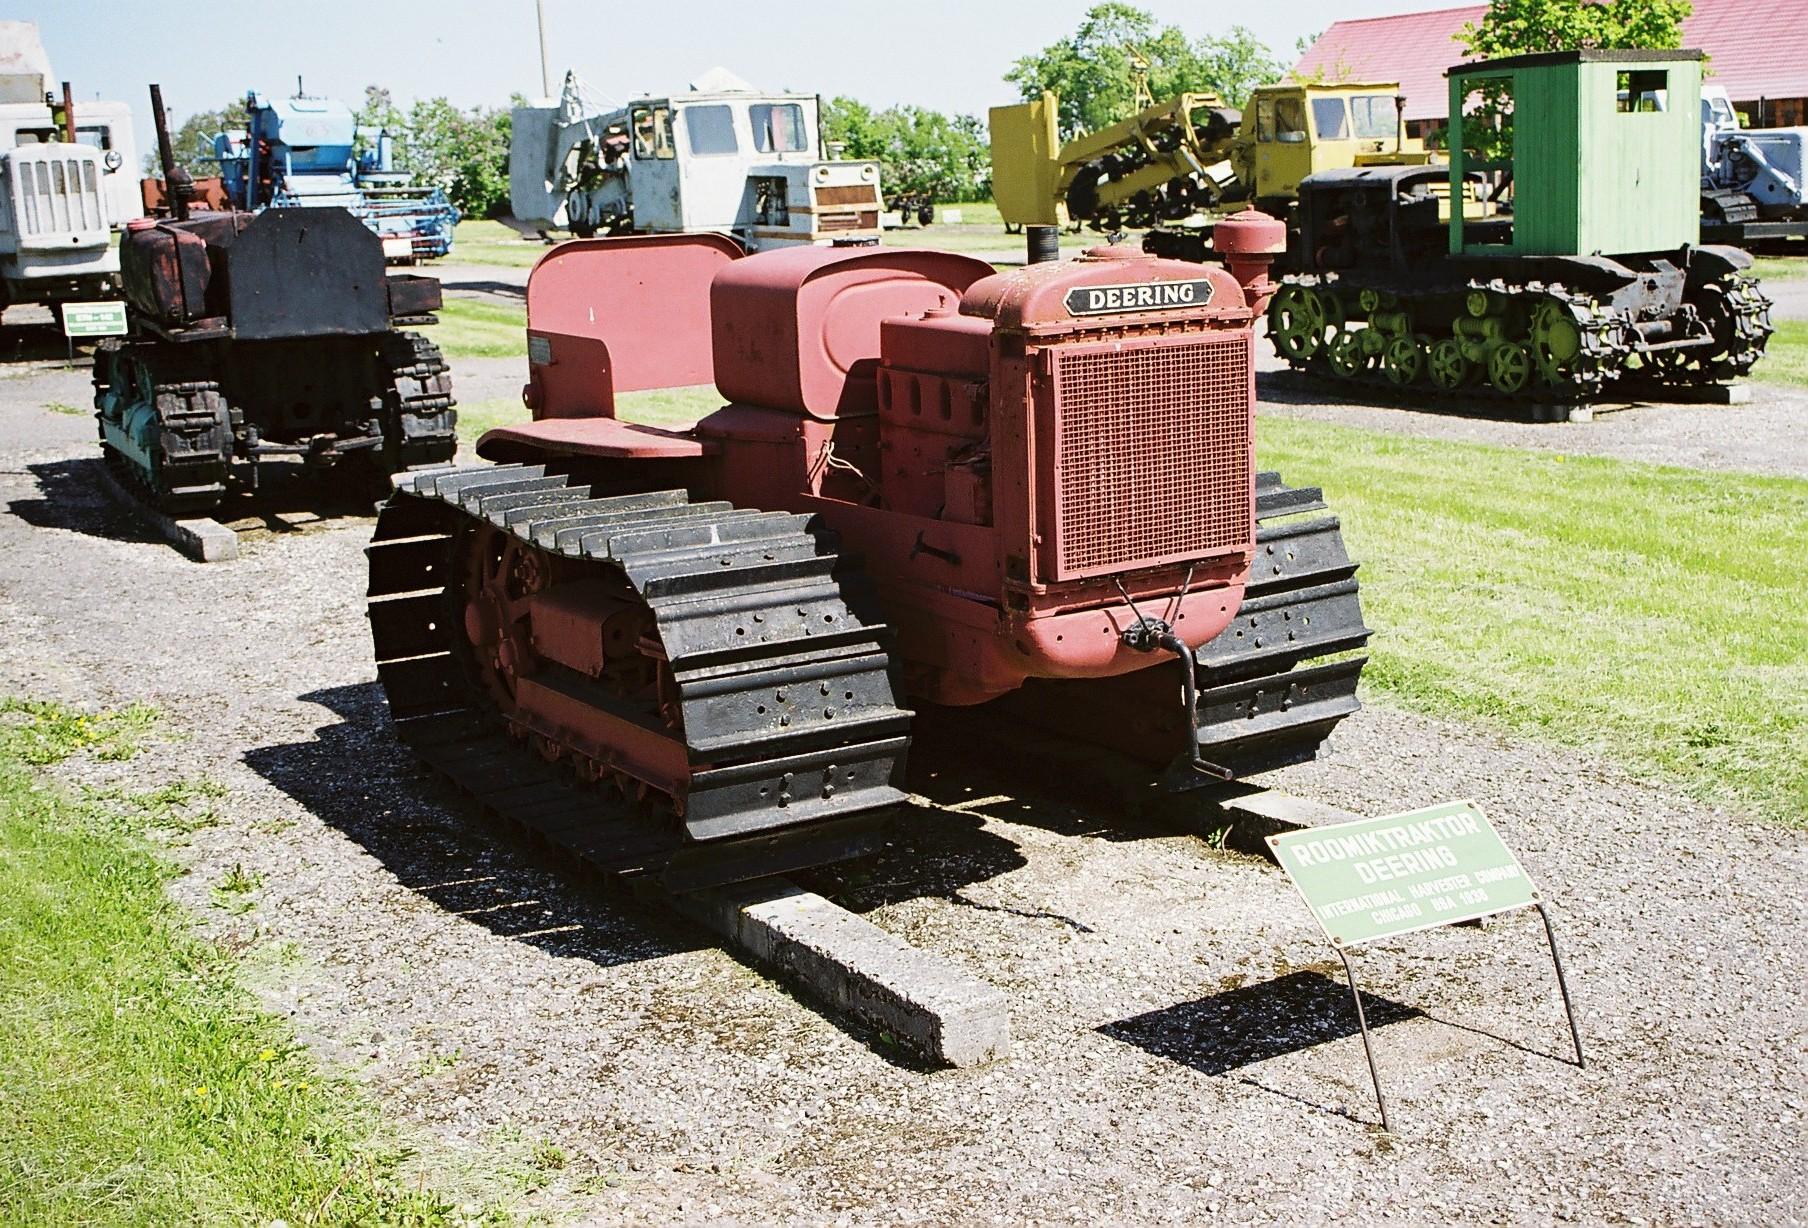 Deering Harvester Company : Super mÁquinas barÃo junior itapetininga international